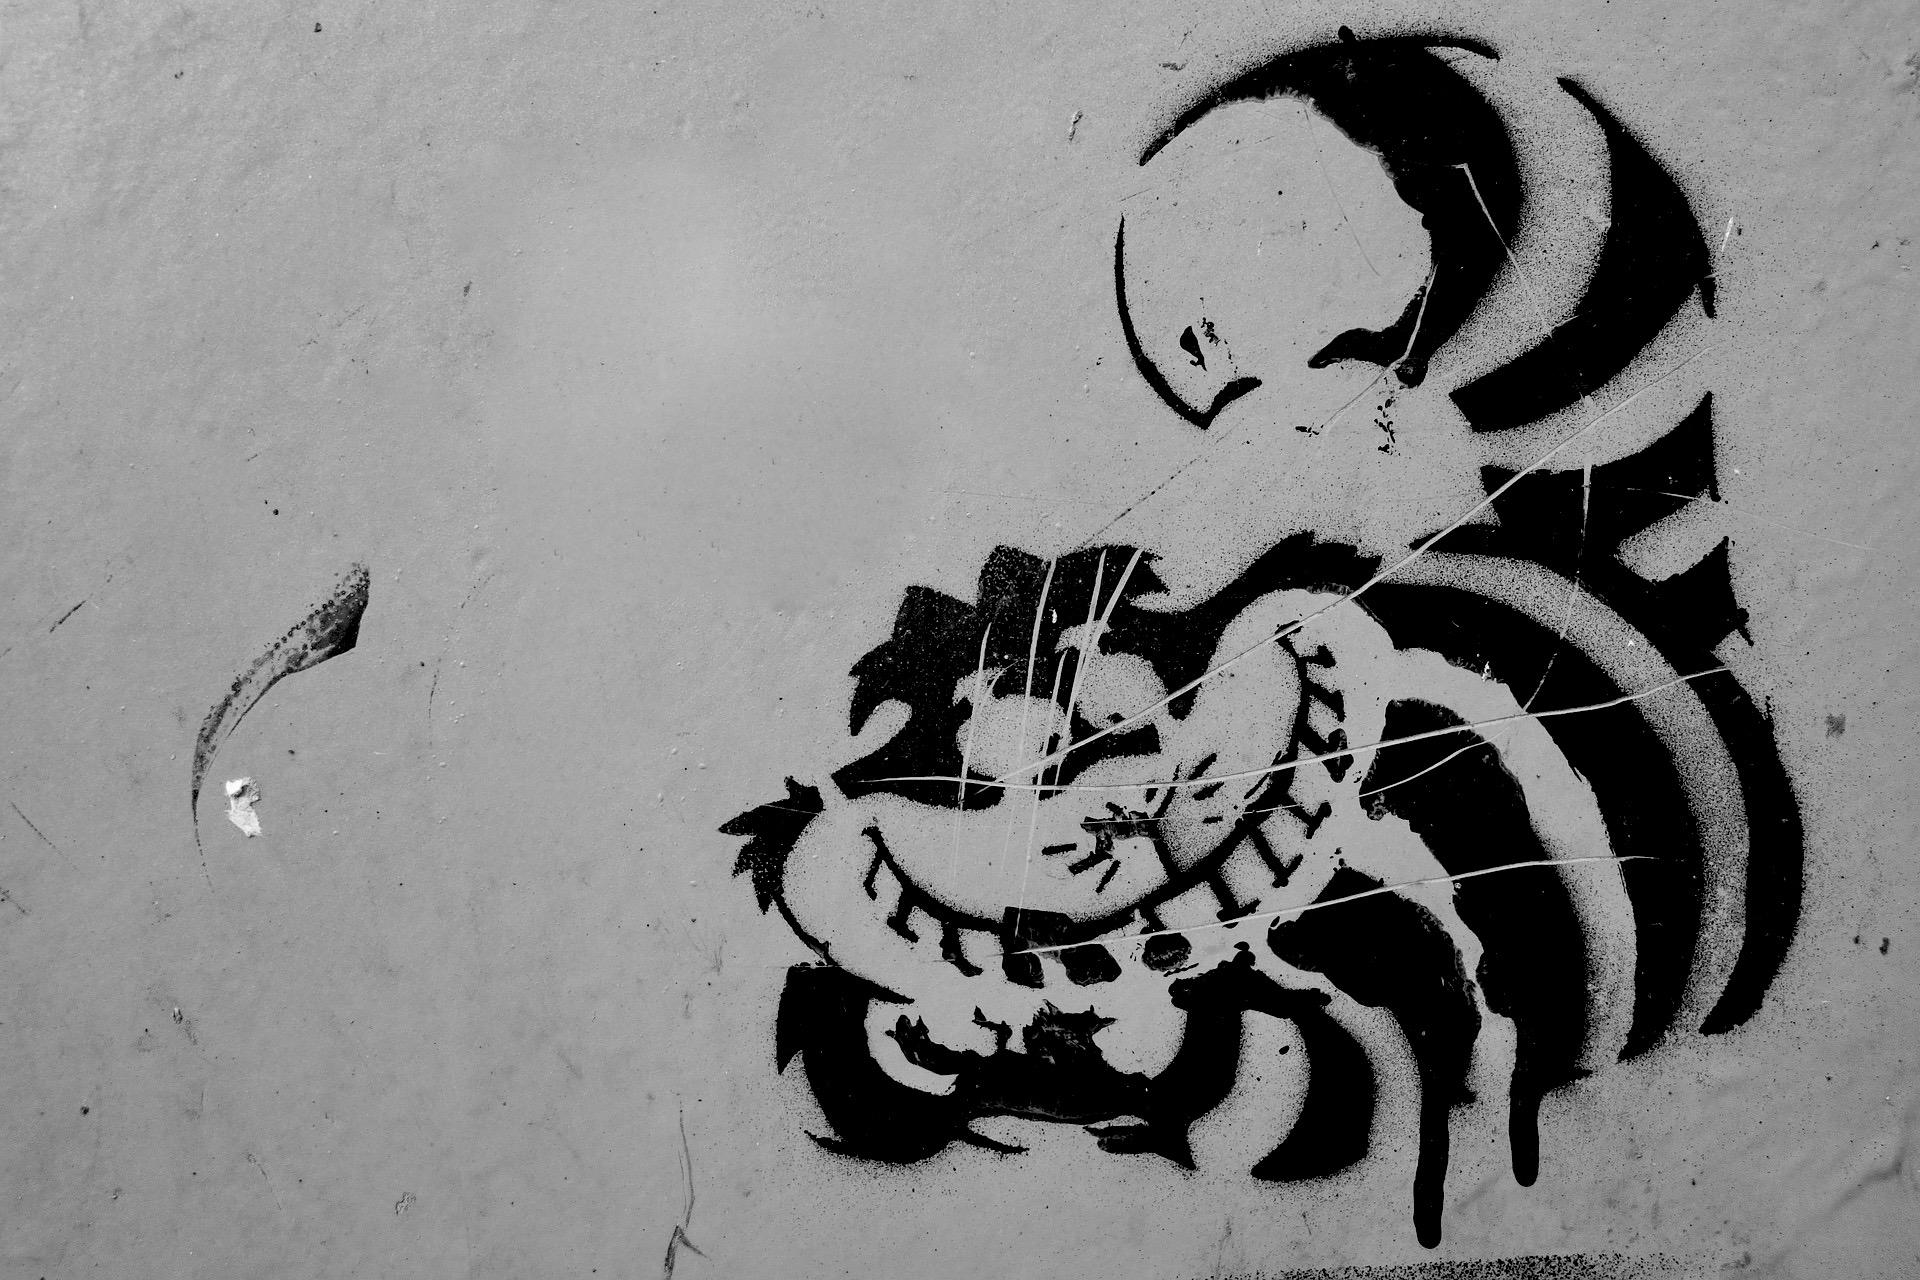 graffiti-1610887_1920_c_kira-hoffmann_pixabay